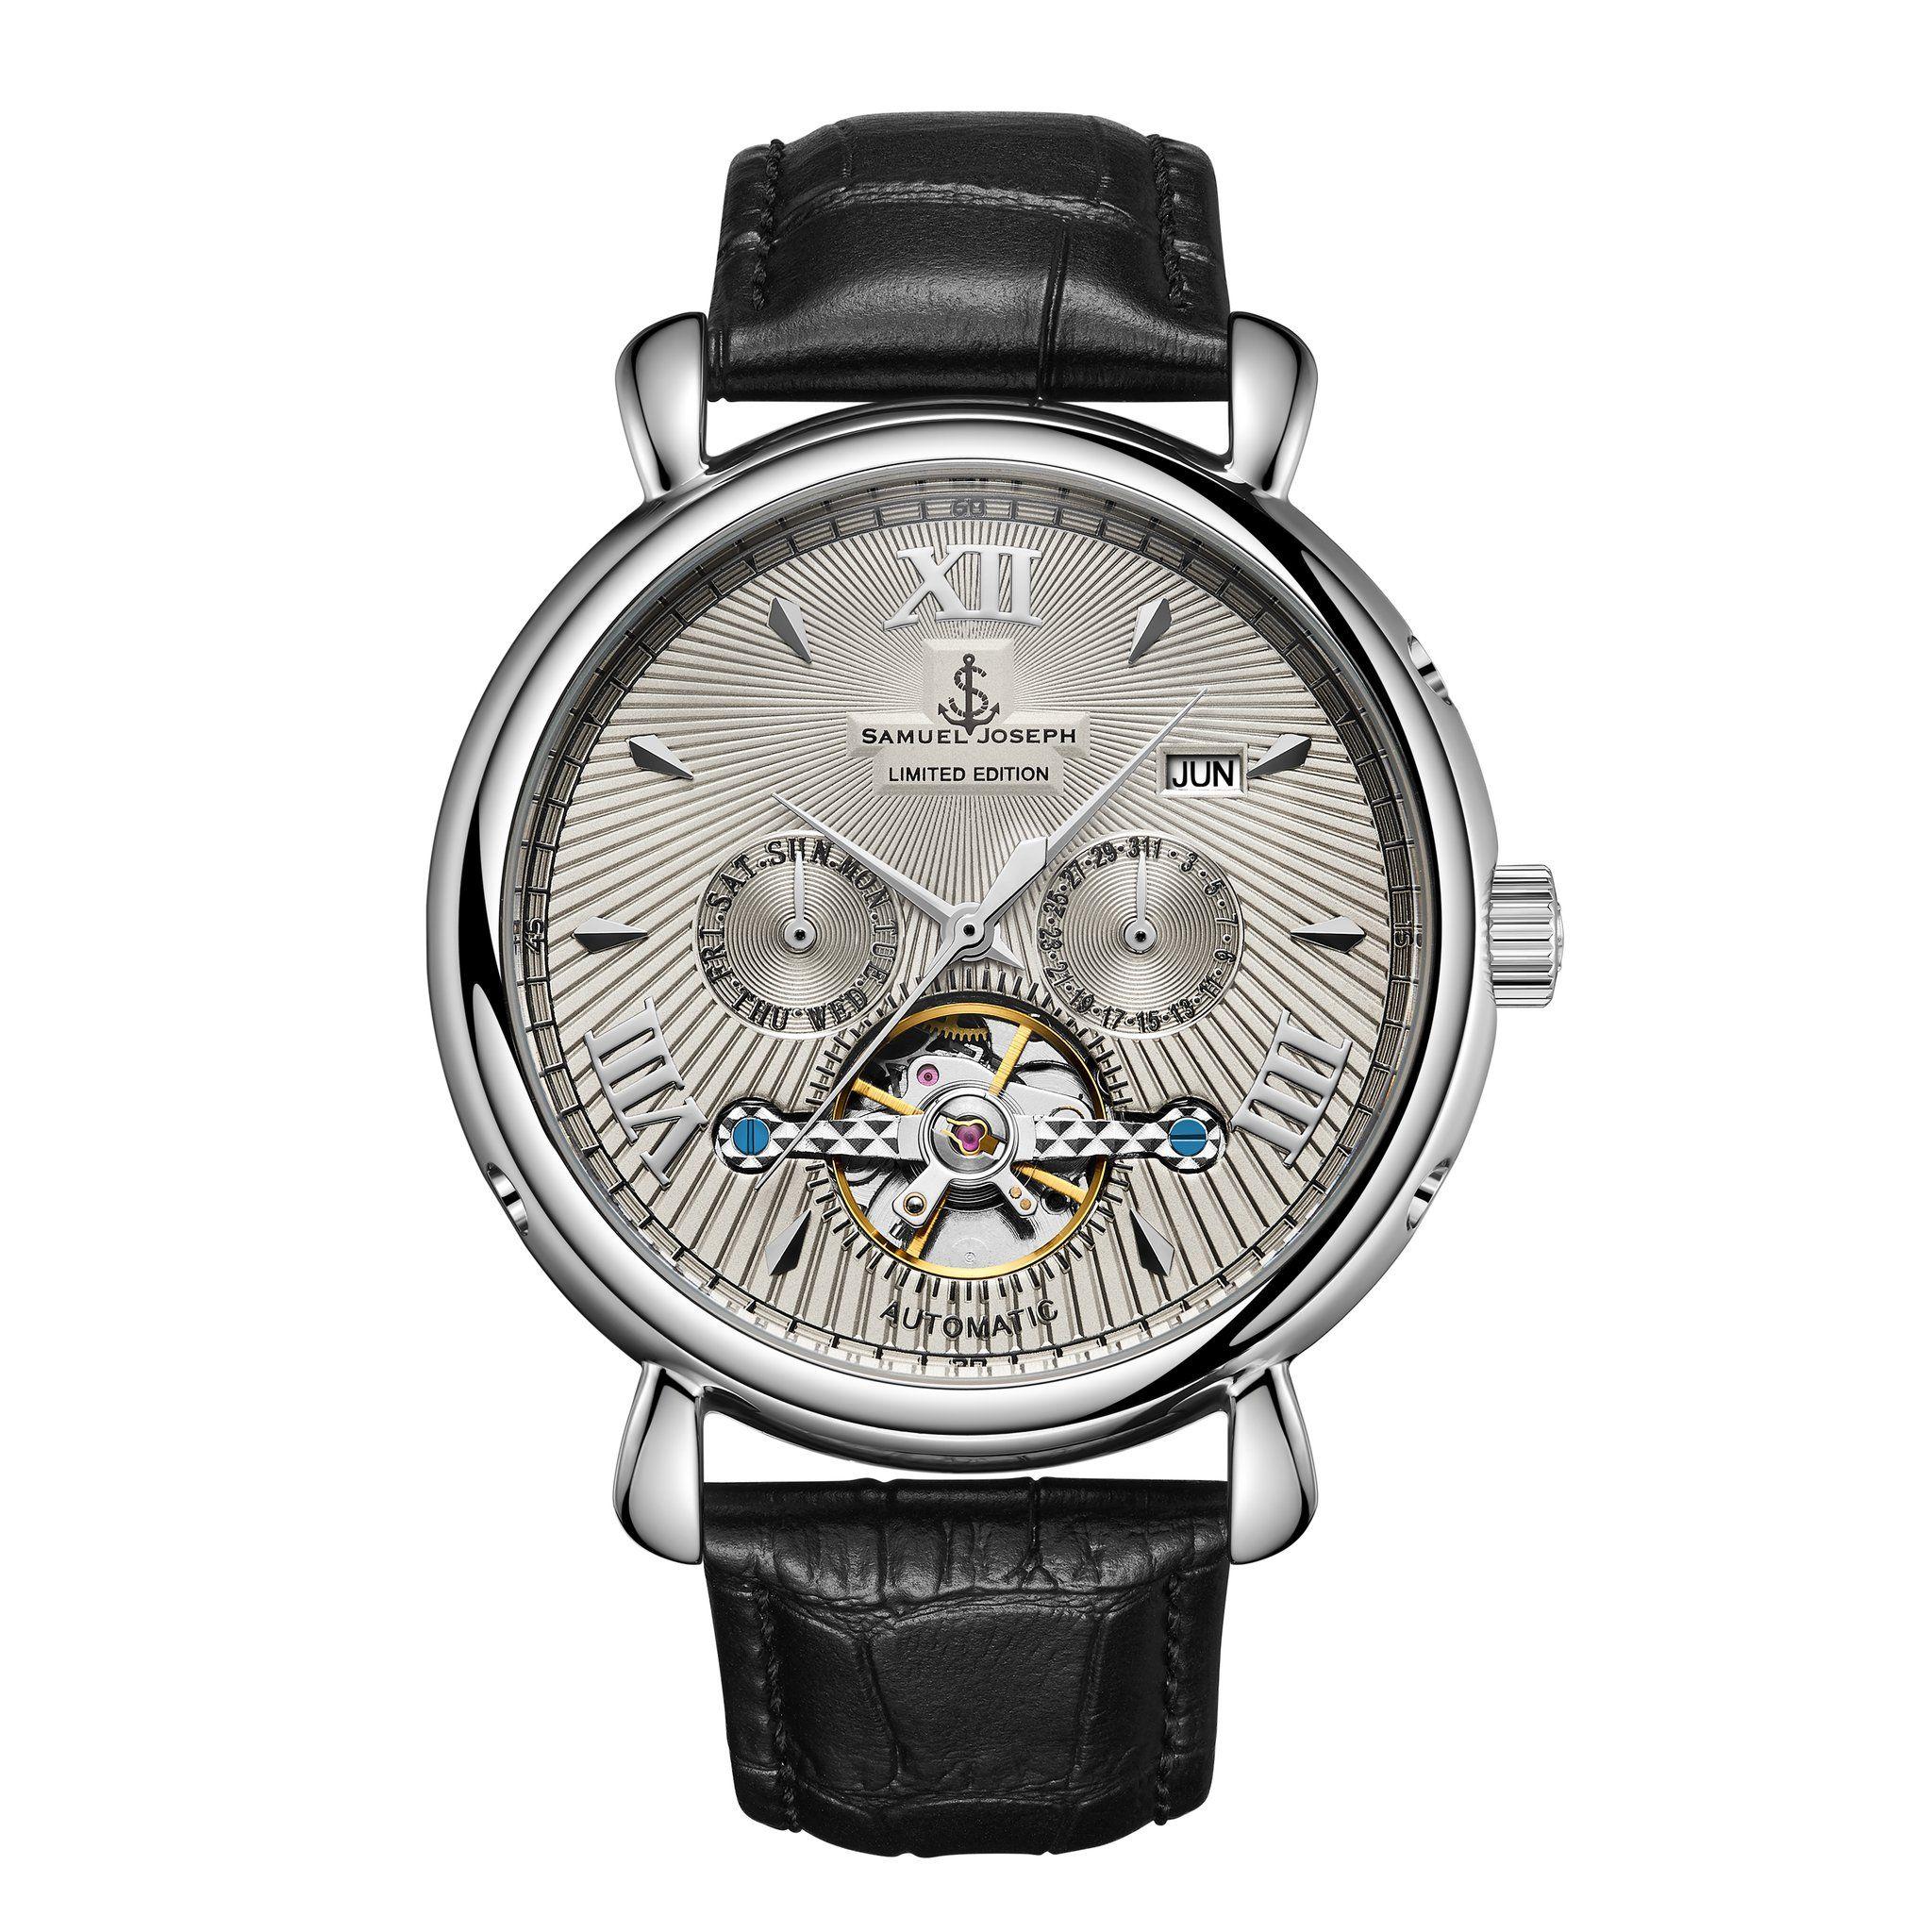 Samuel Joseph Limited Edition Steel & Blue Automatic Designer Mens Watch